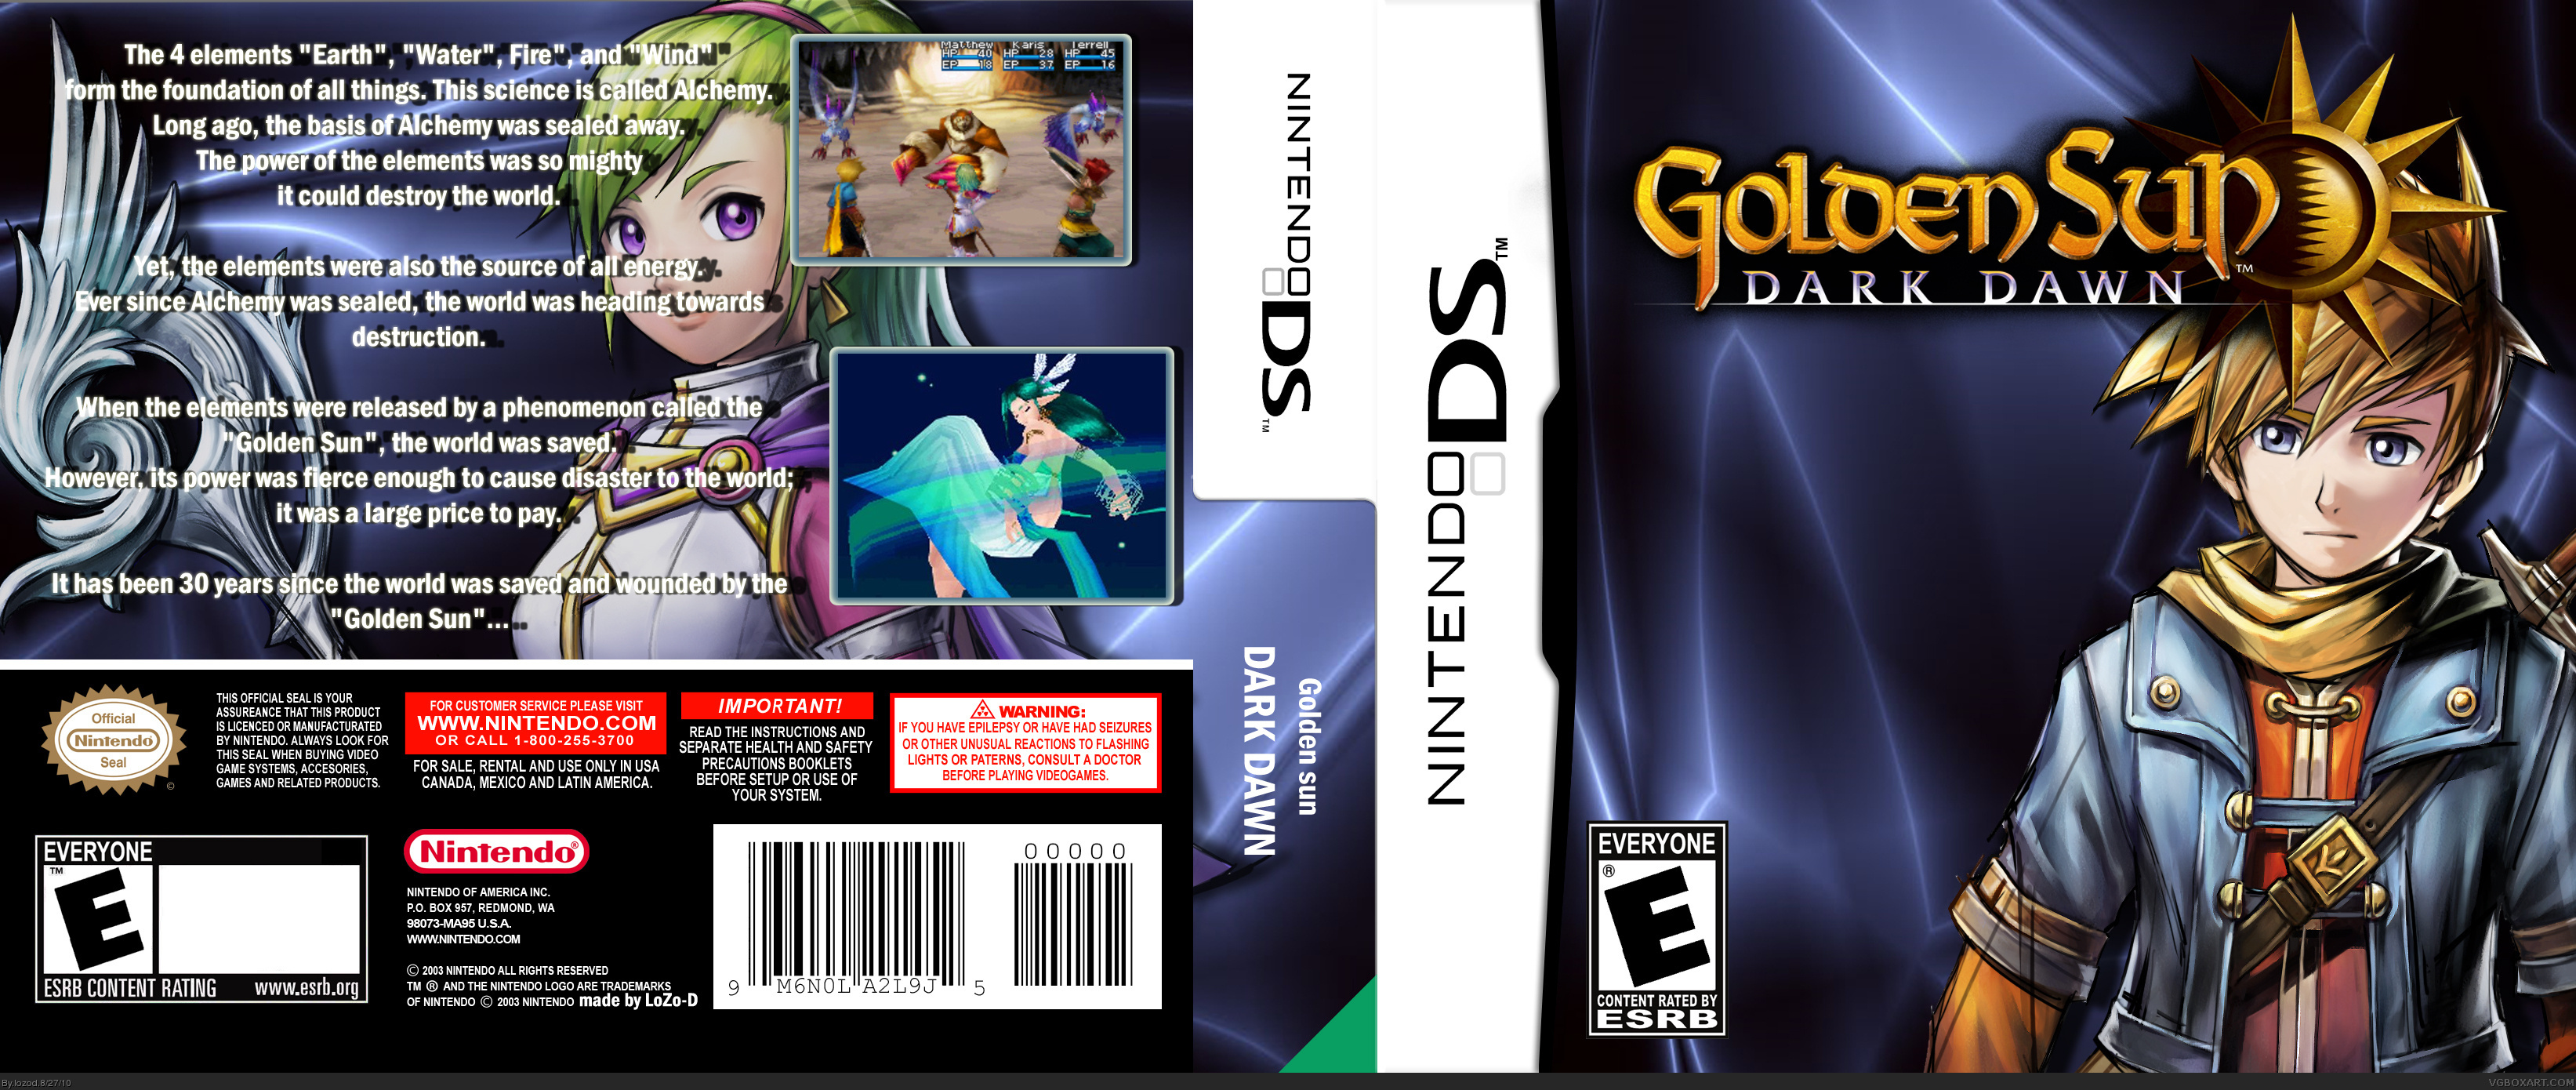 Golden Sun: Dark Dawn Nintendo DS Box Art Cover by lozod